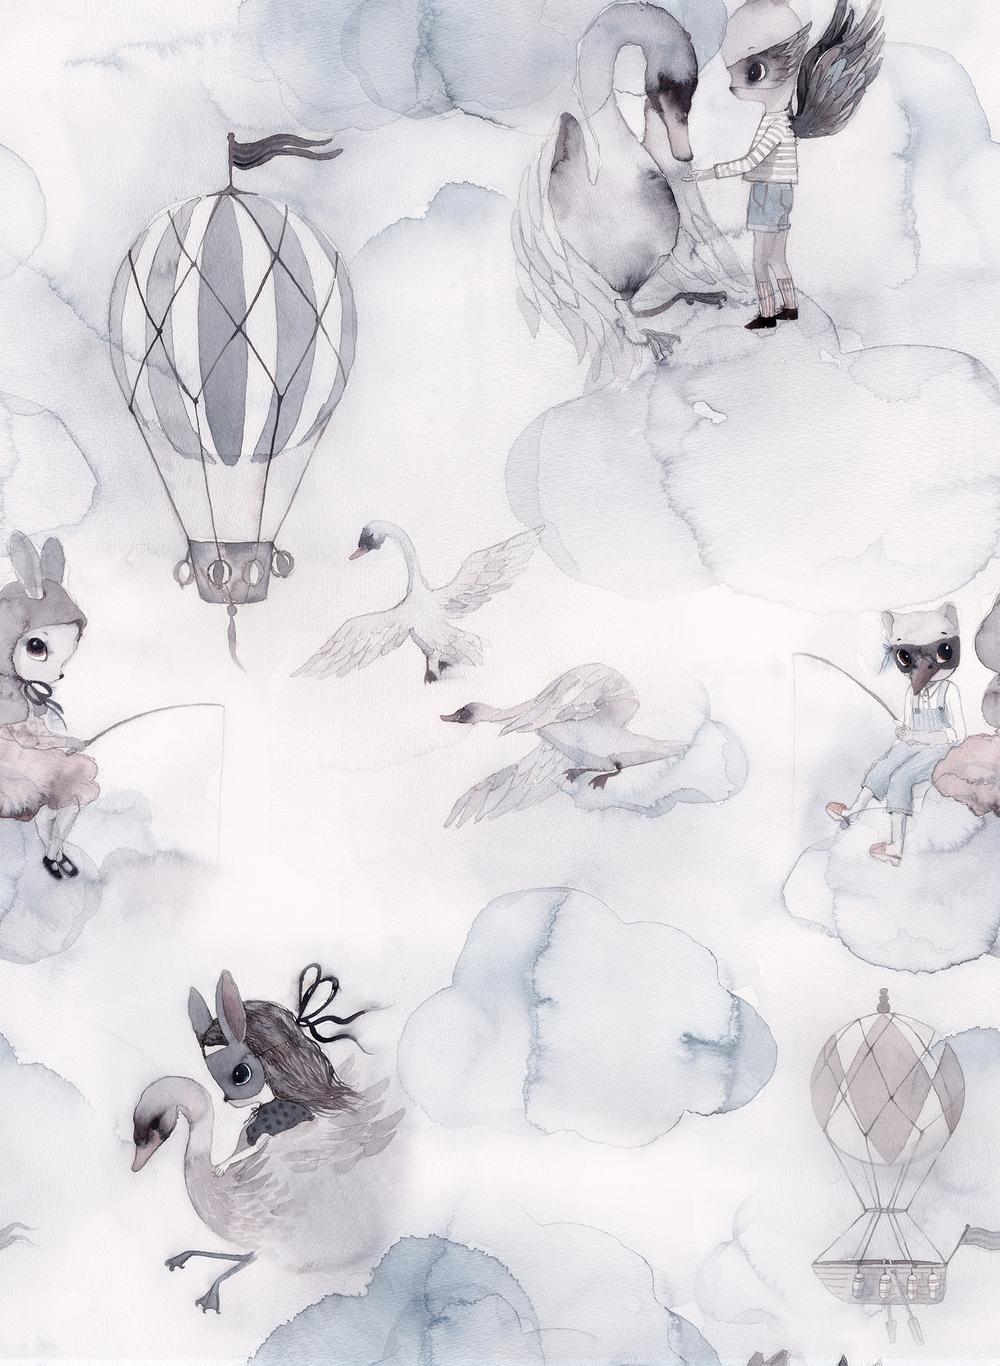 wallpaper-720x933.jpg